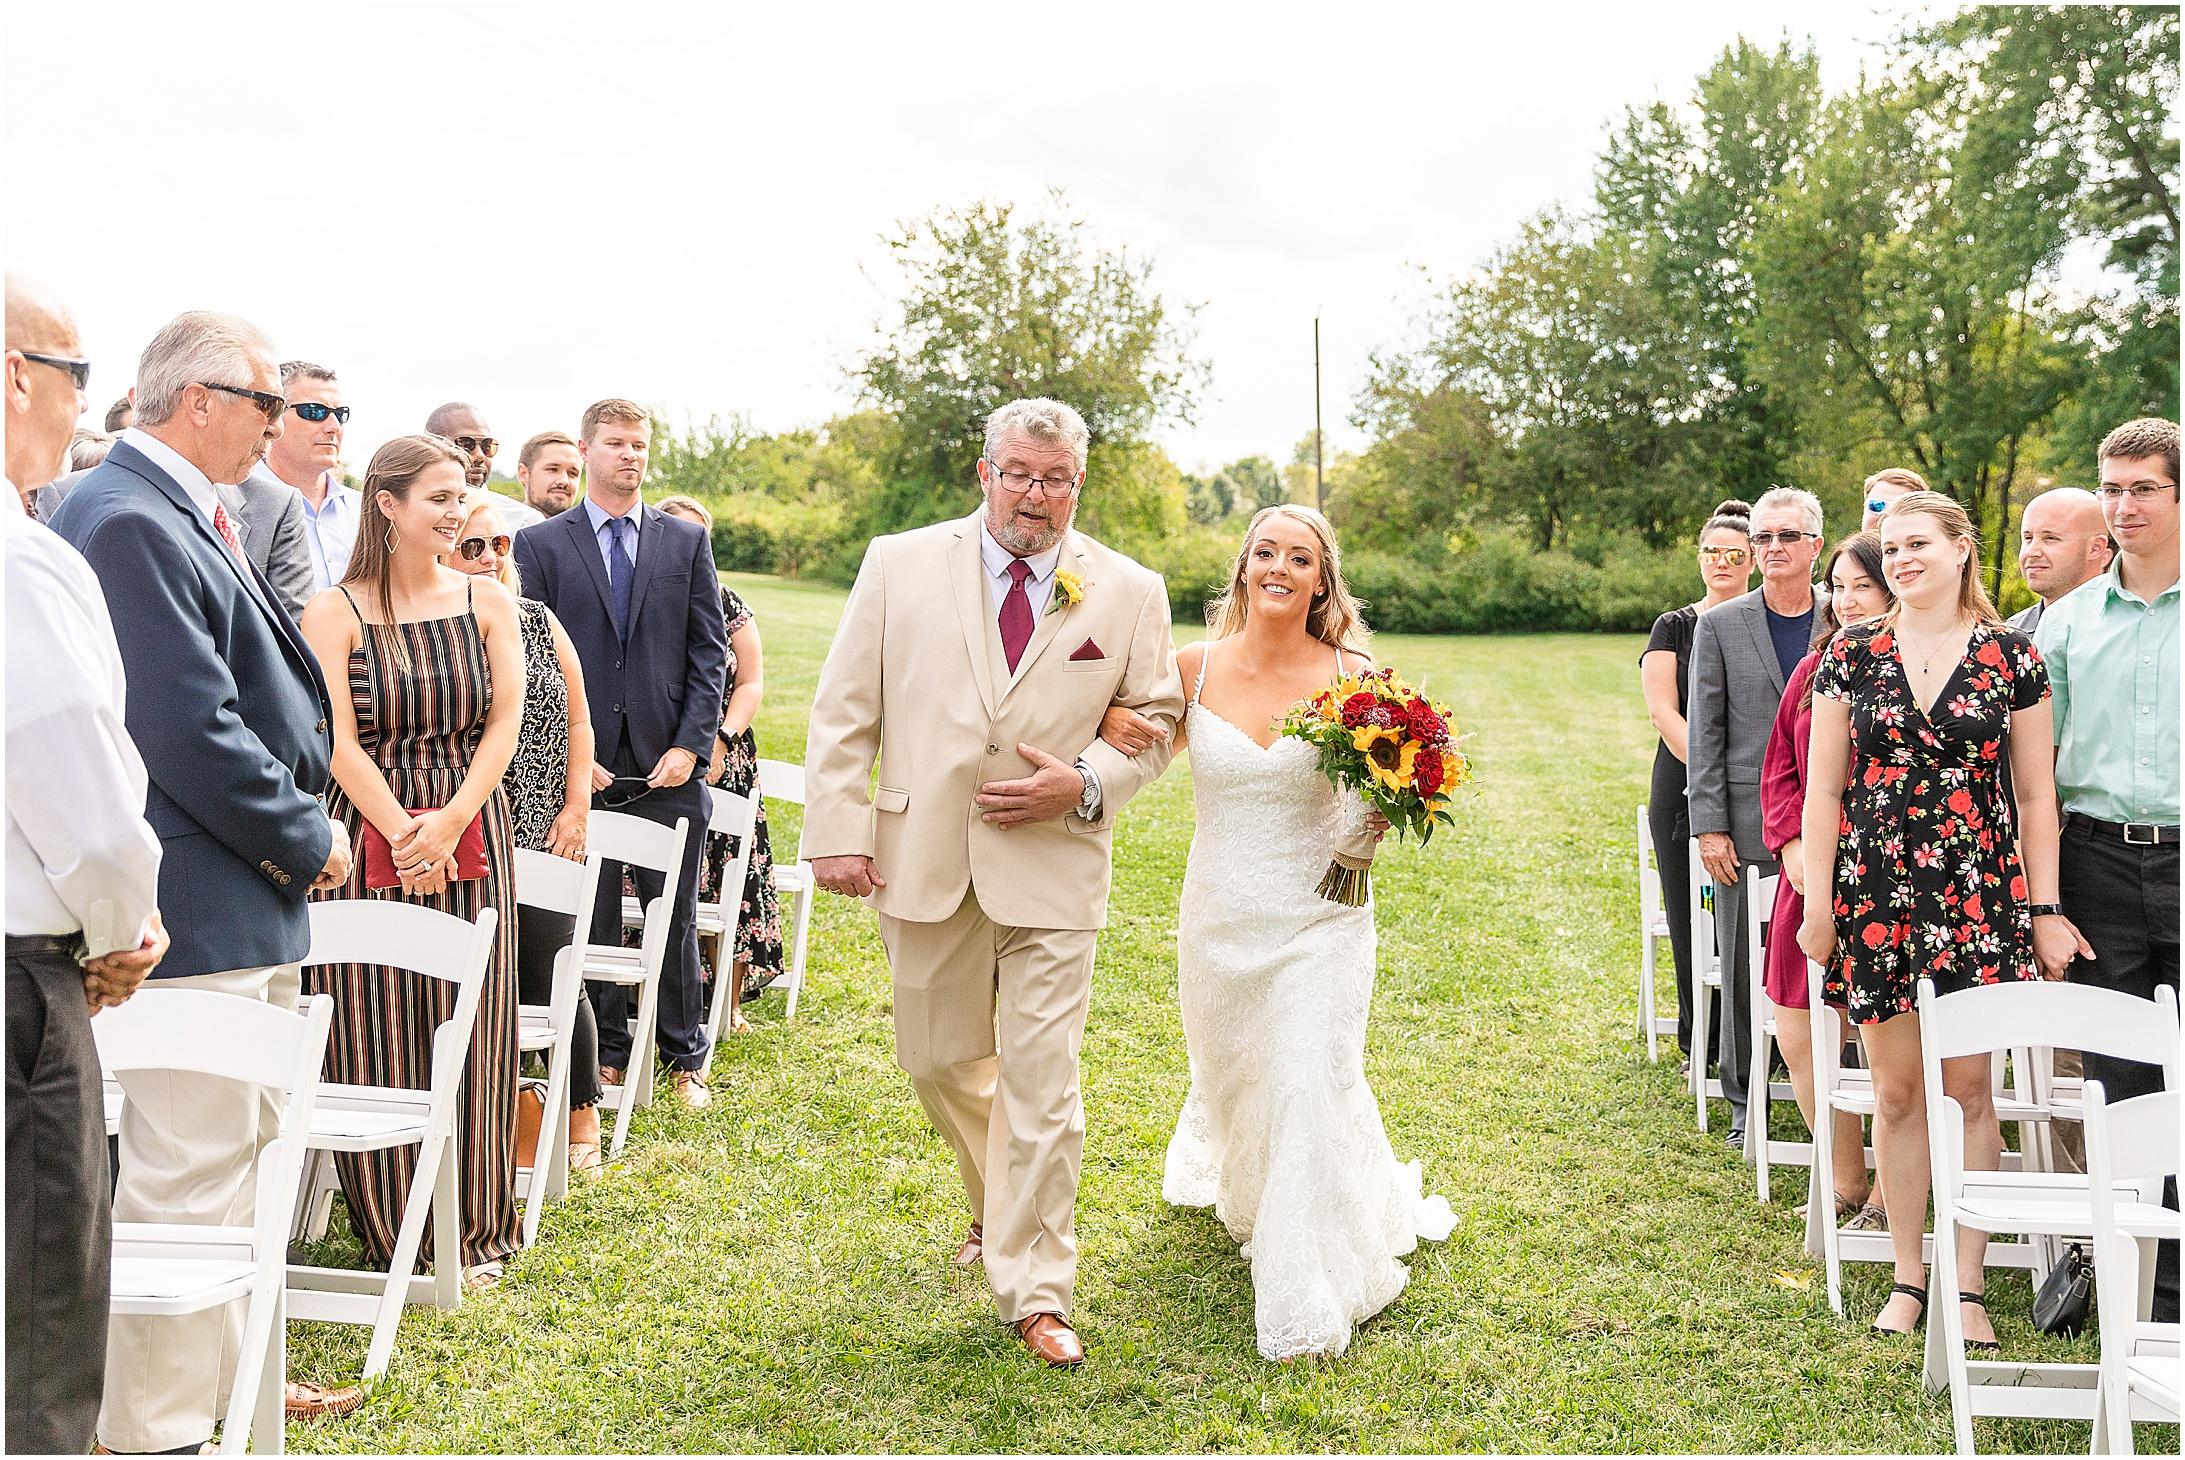 Christian-Royer-House-Wedding-Photos_0560.jpg